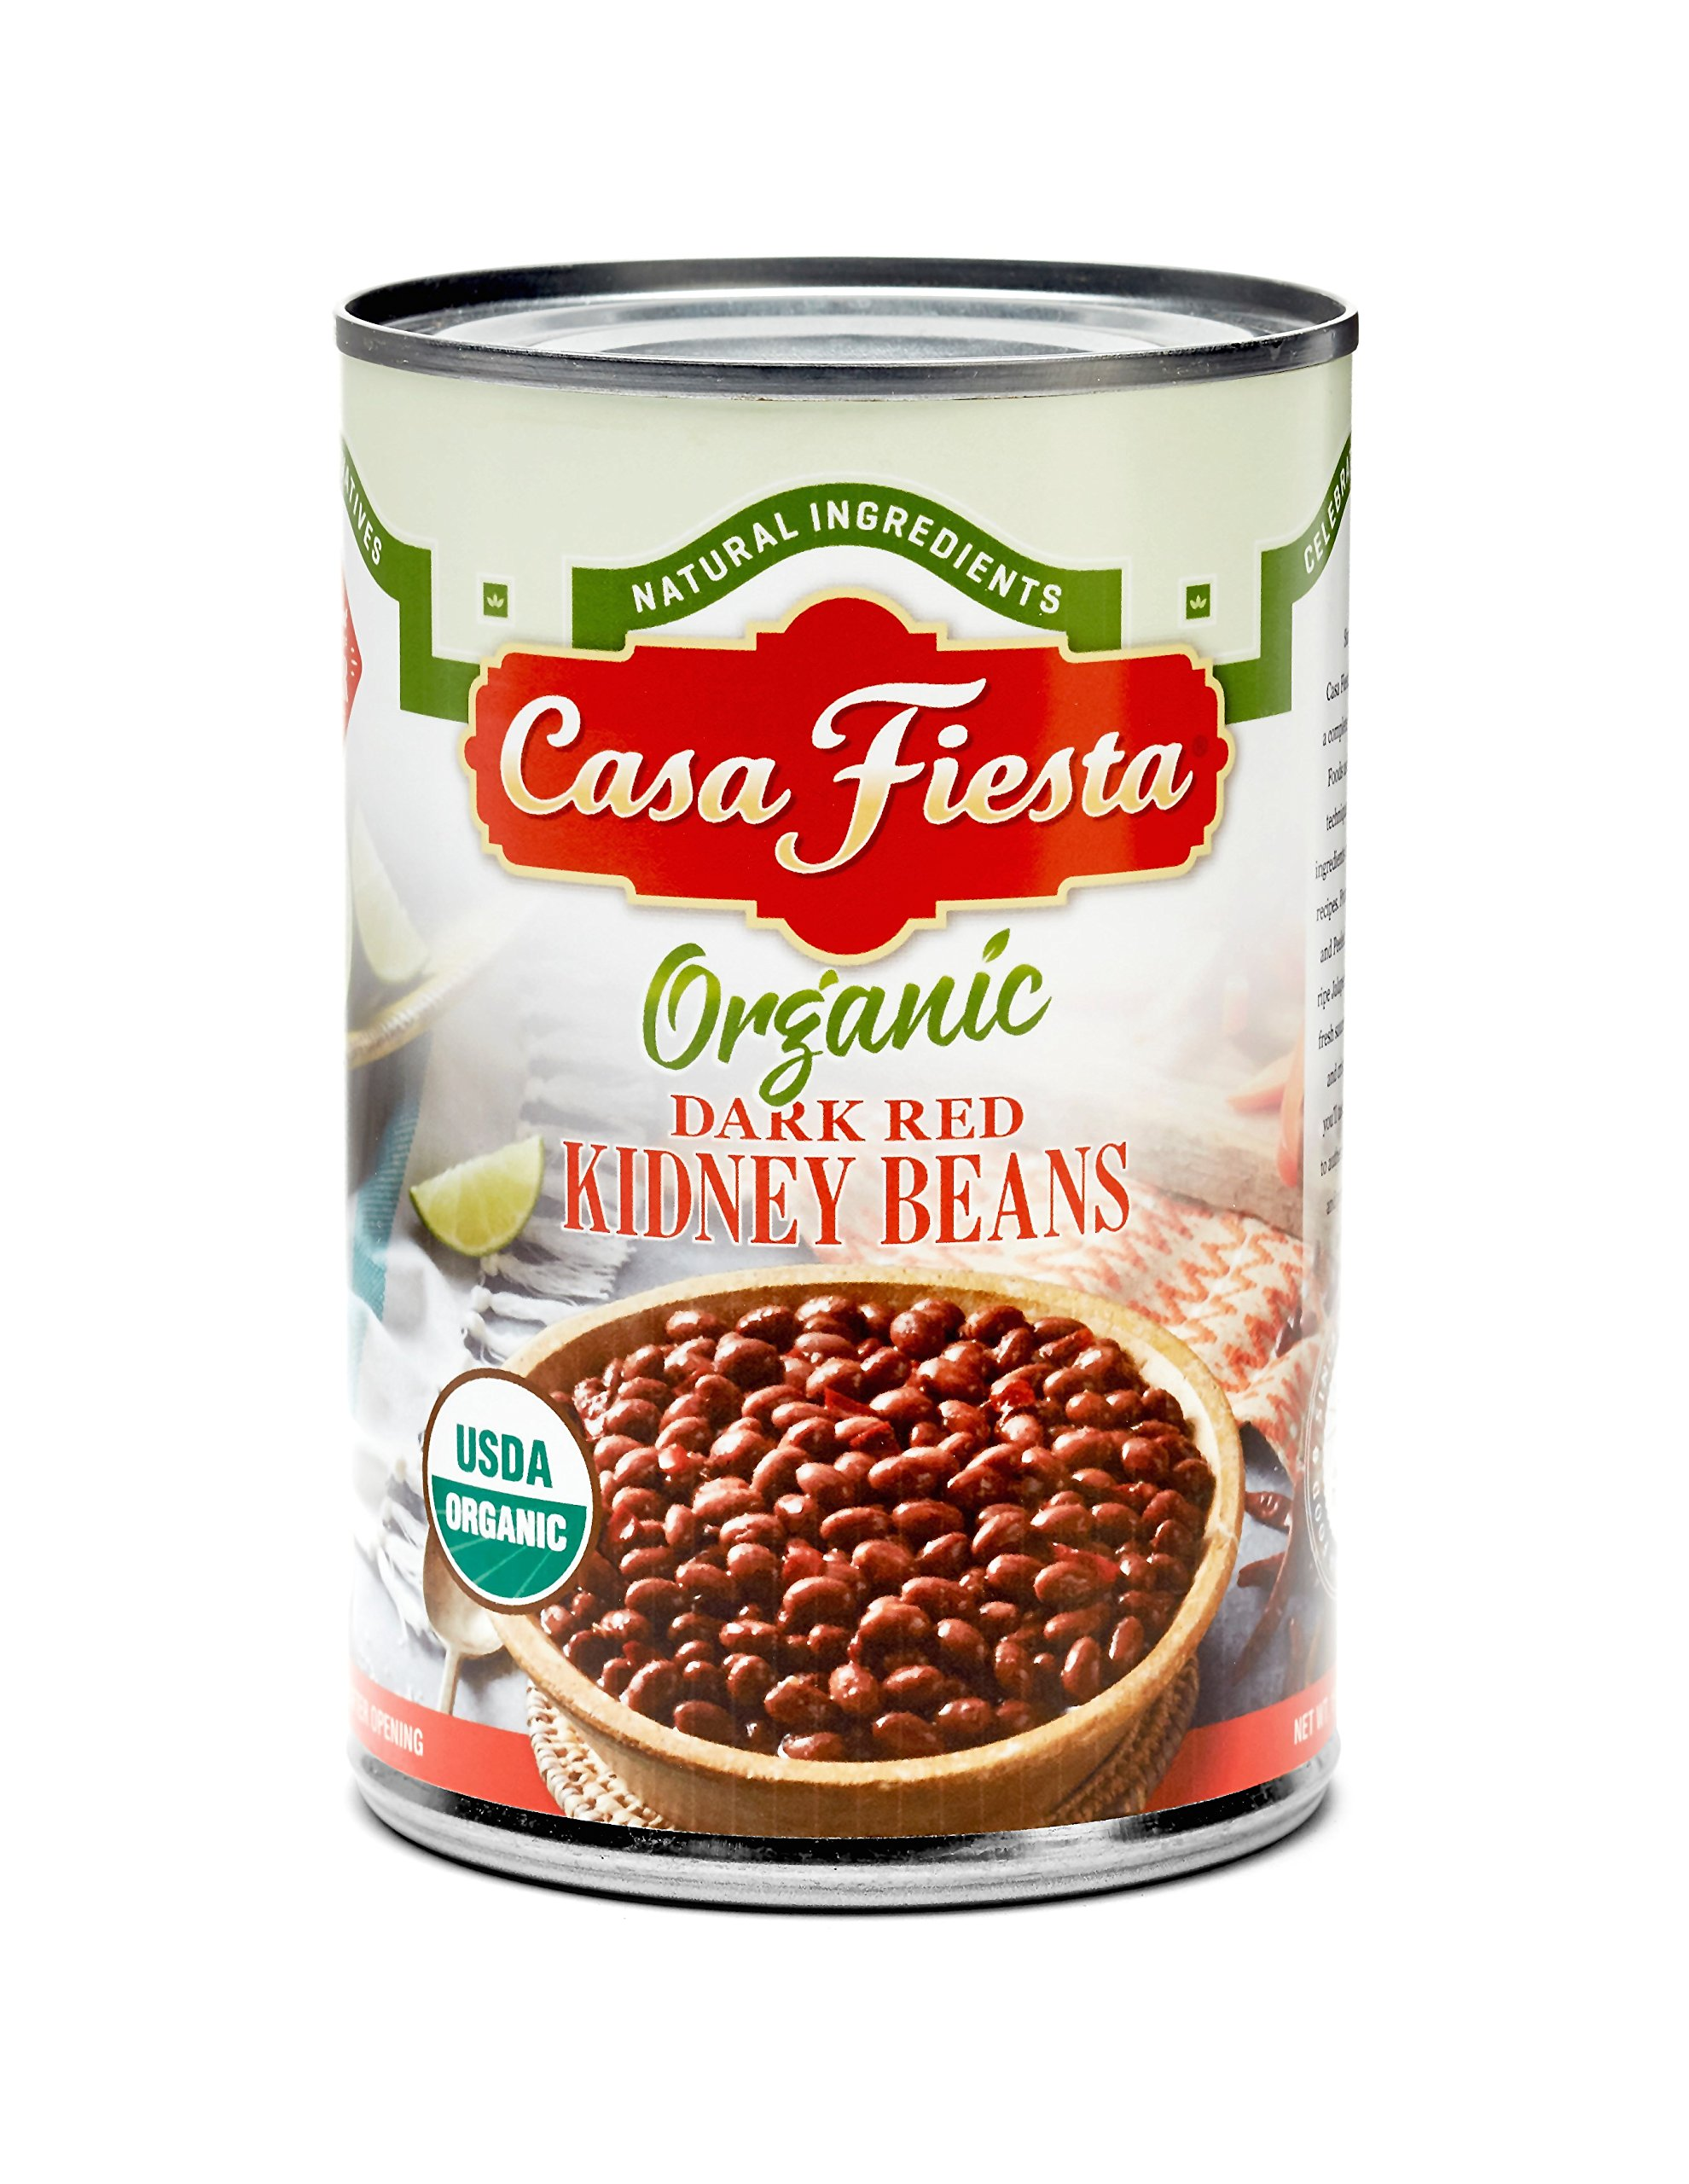 Casa Fiesta Organic Dark Red Kidney Beans 15oz 12 pack